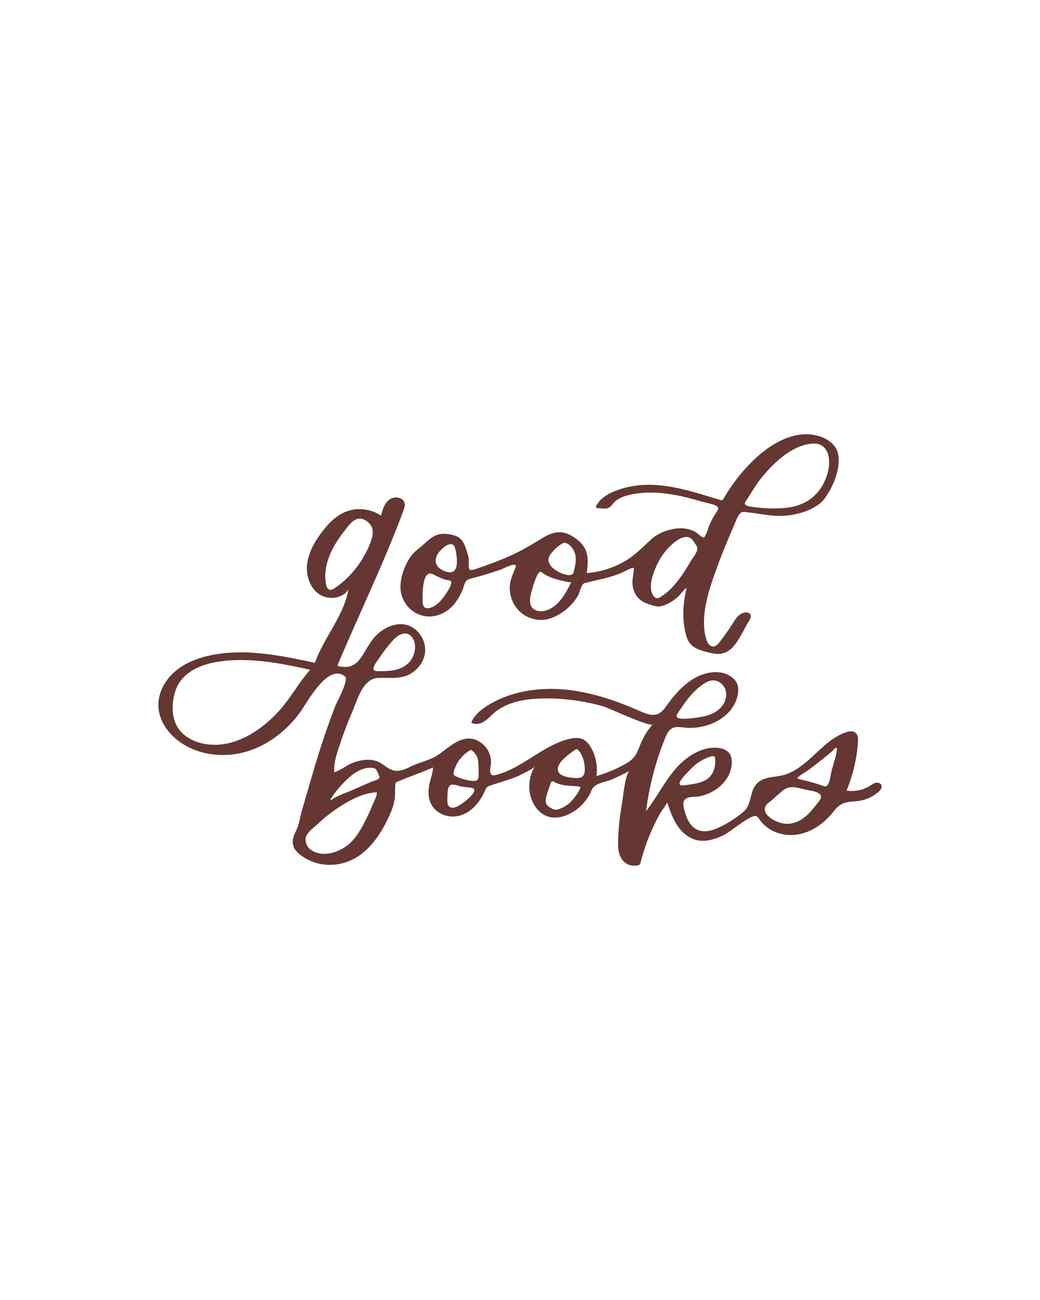 """good books"" calligraphy"